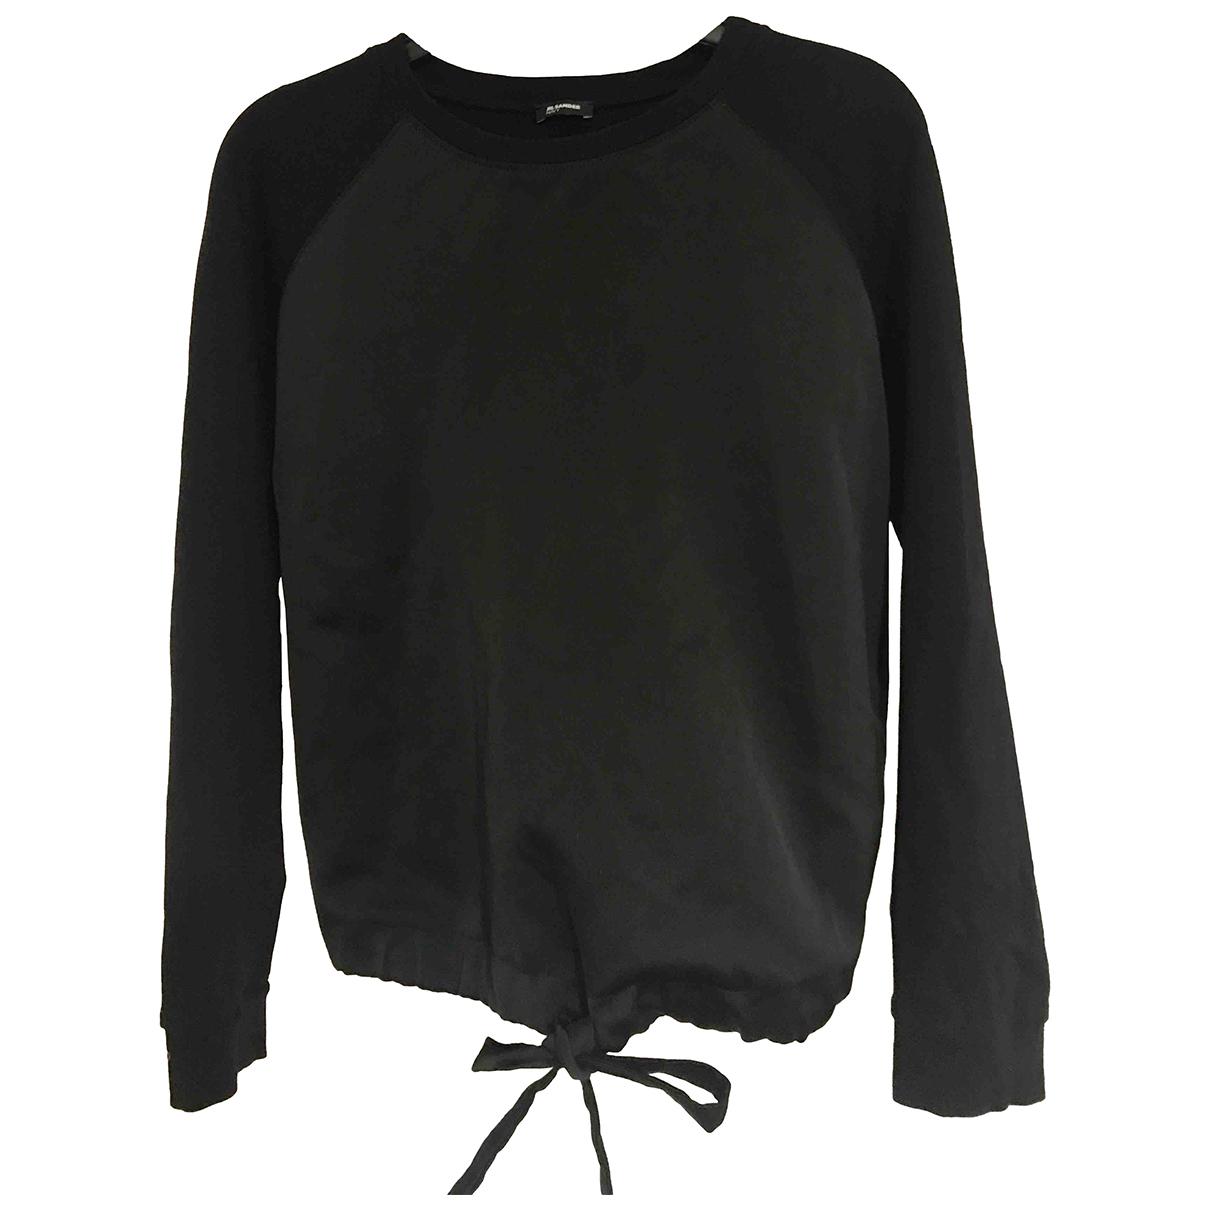 Jil Sander \N Pullover in  Schwarz Polyester